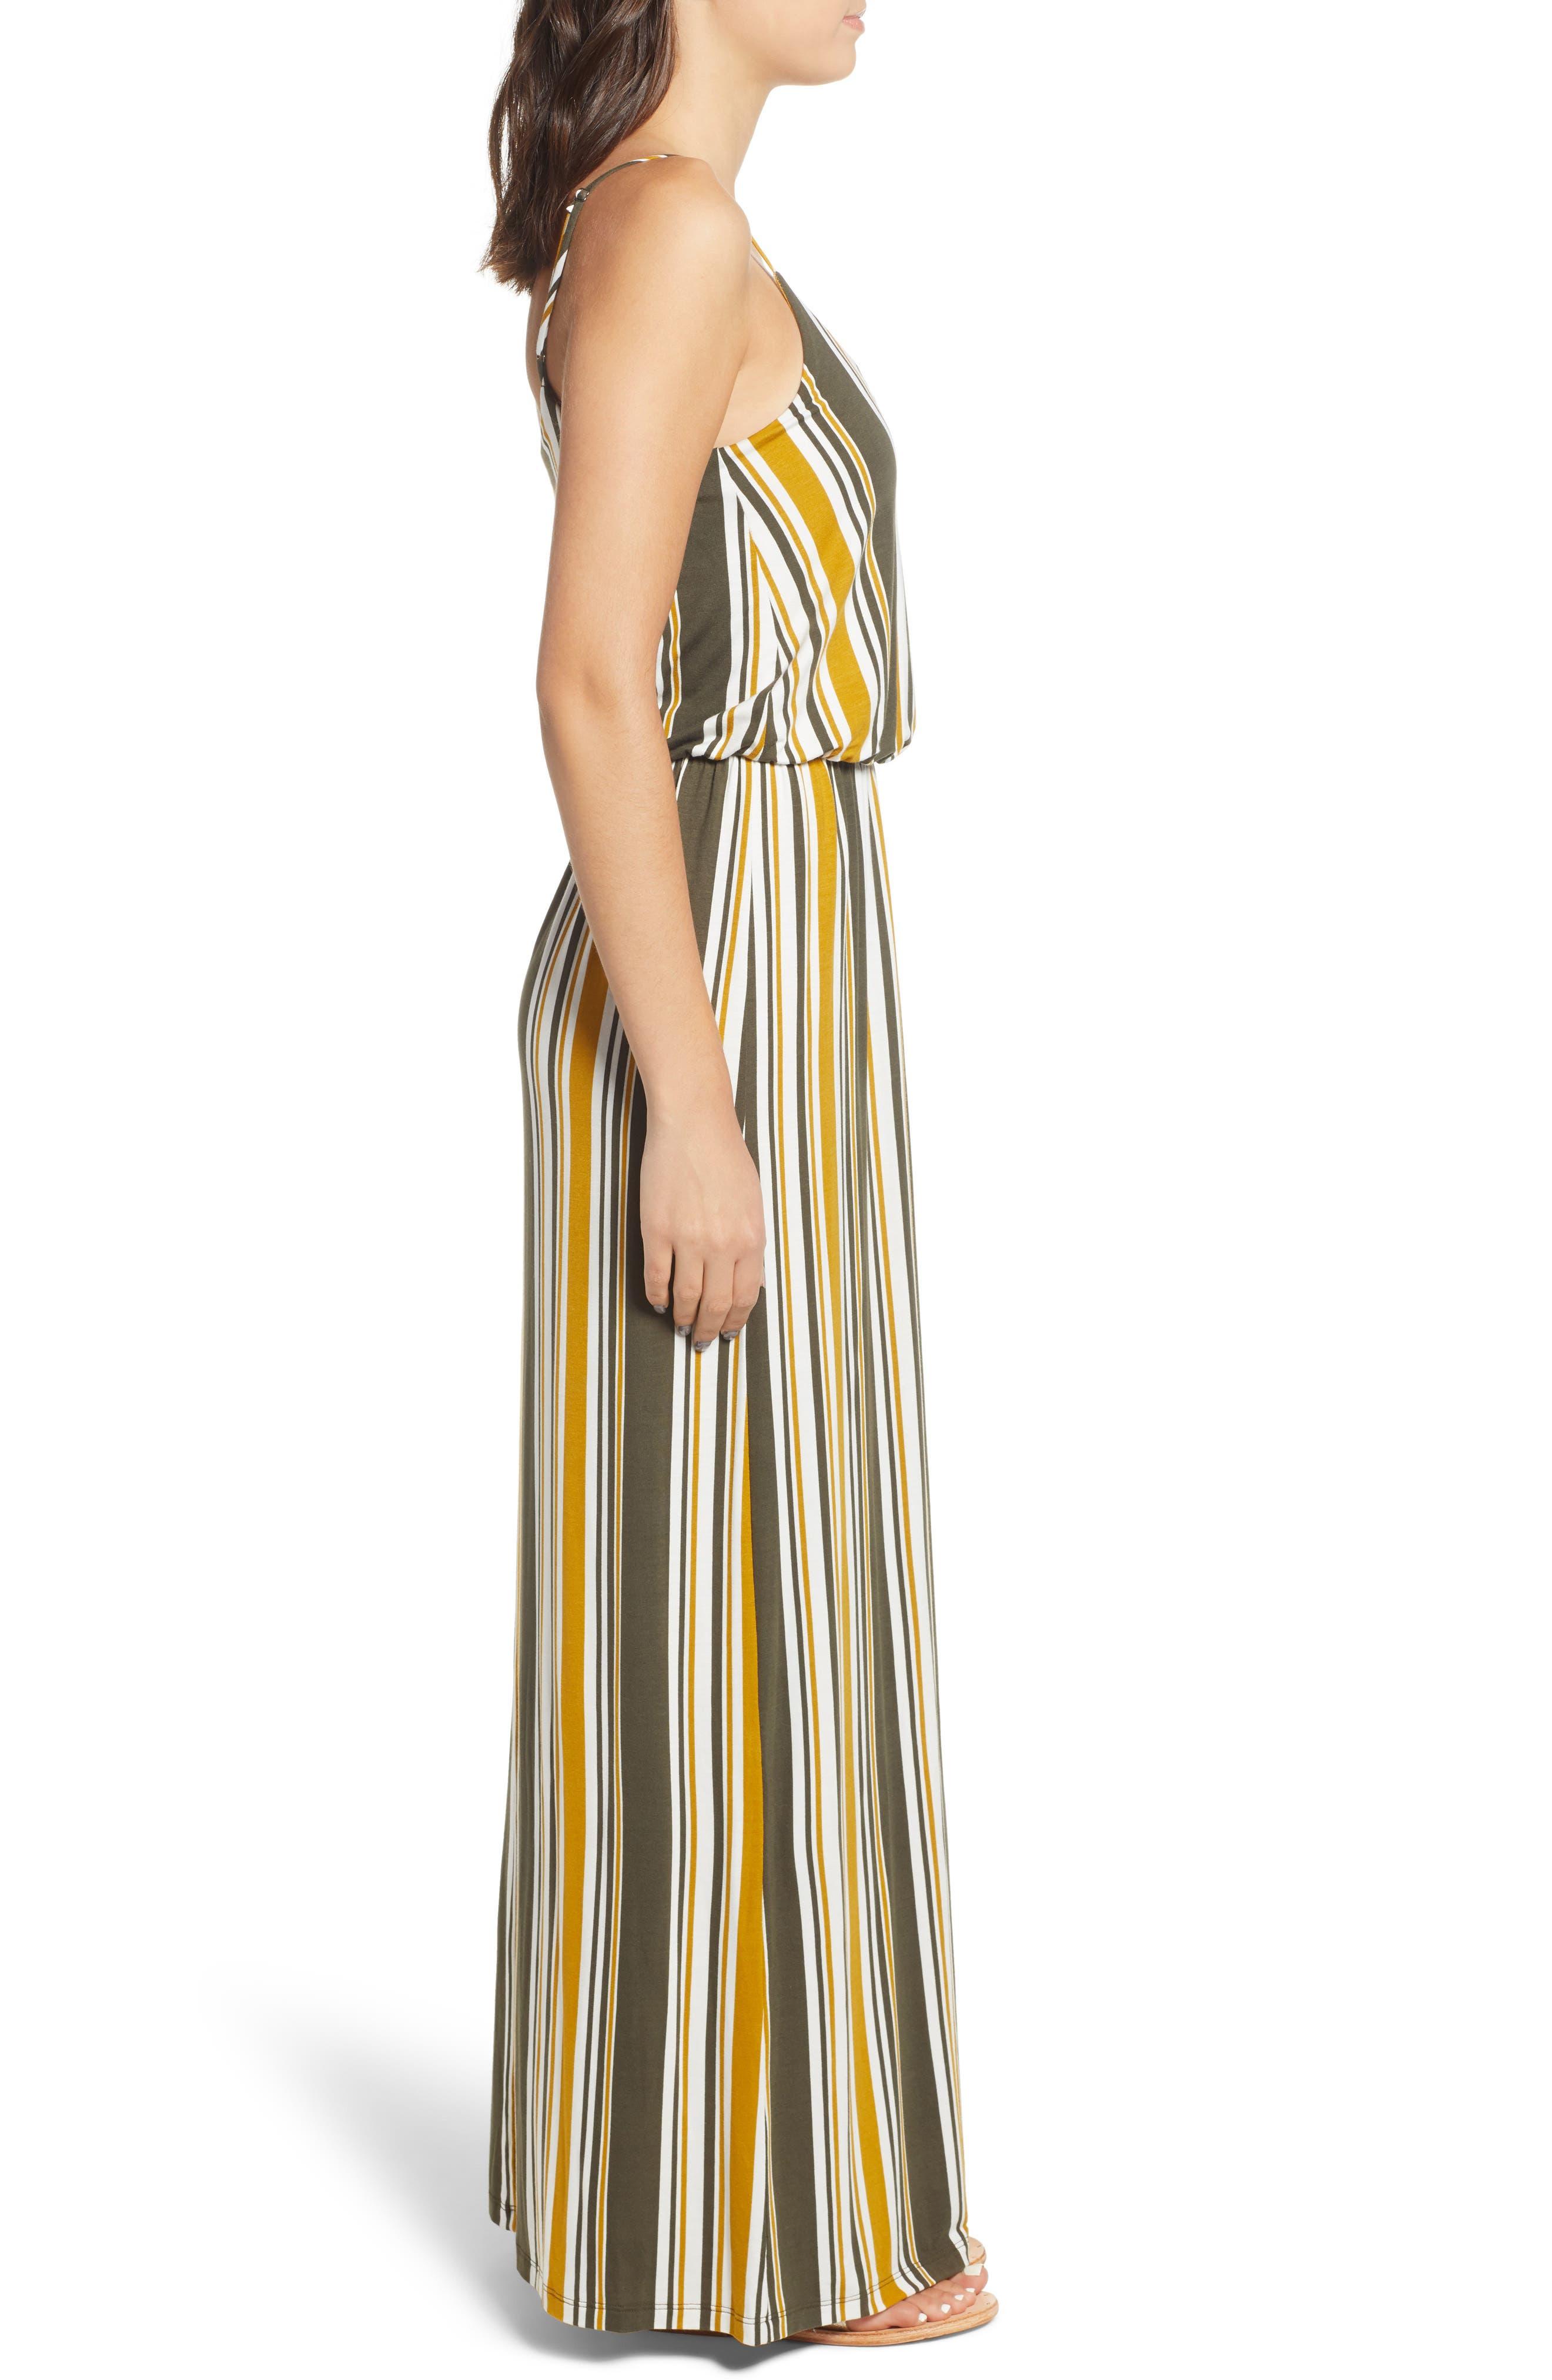 Knit Maxi Dress,                             Alternate thumbnail 3, color,                             ARMY GREEN/ MUSTARD